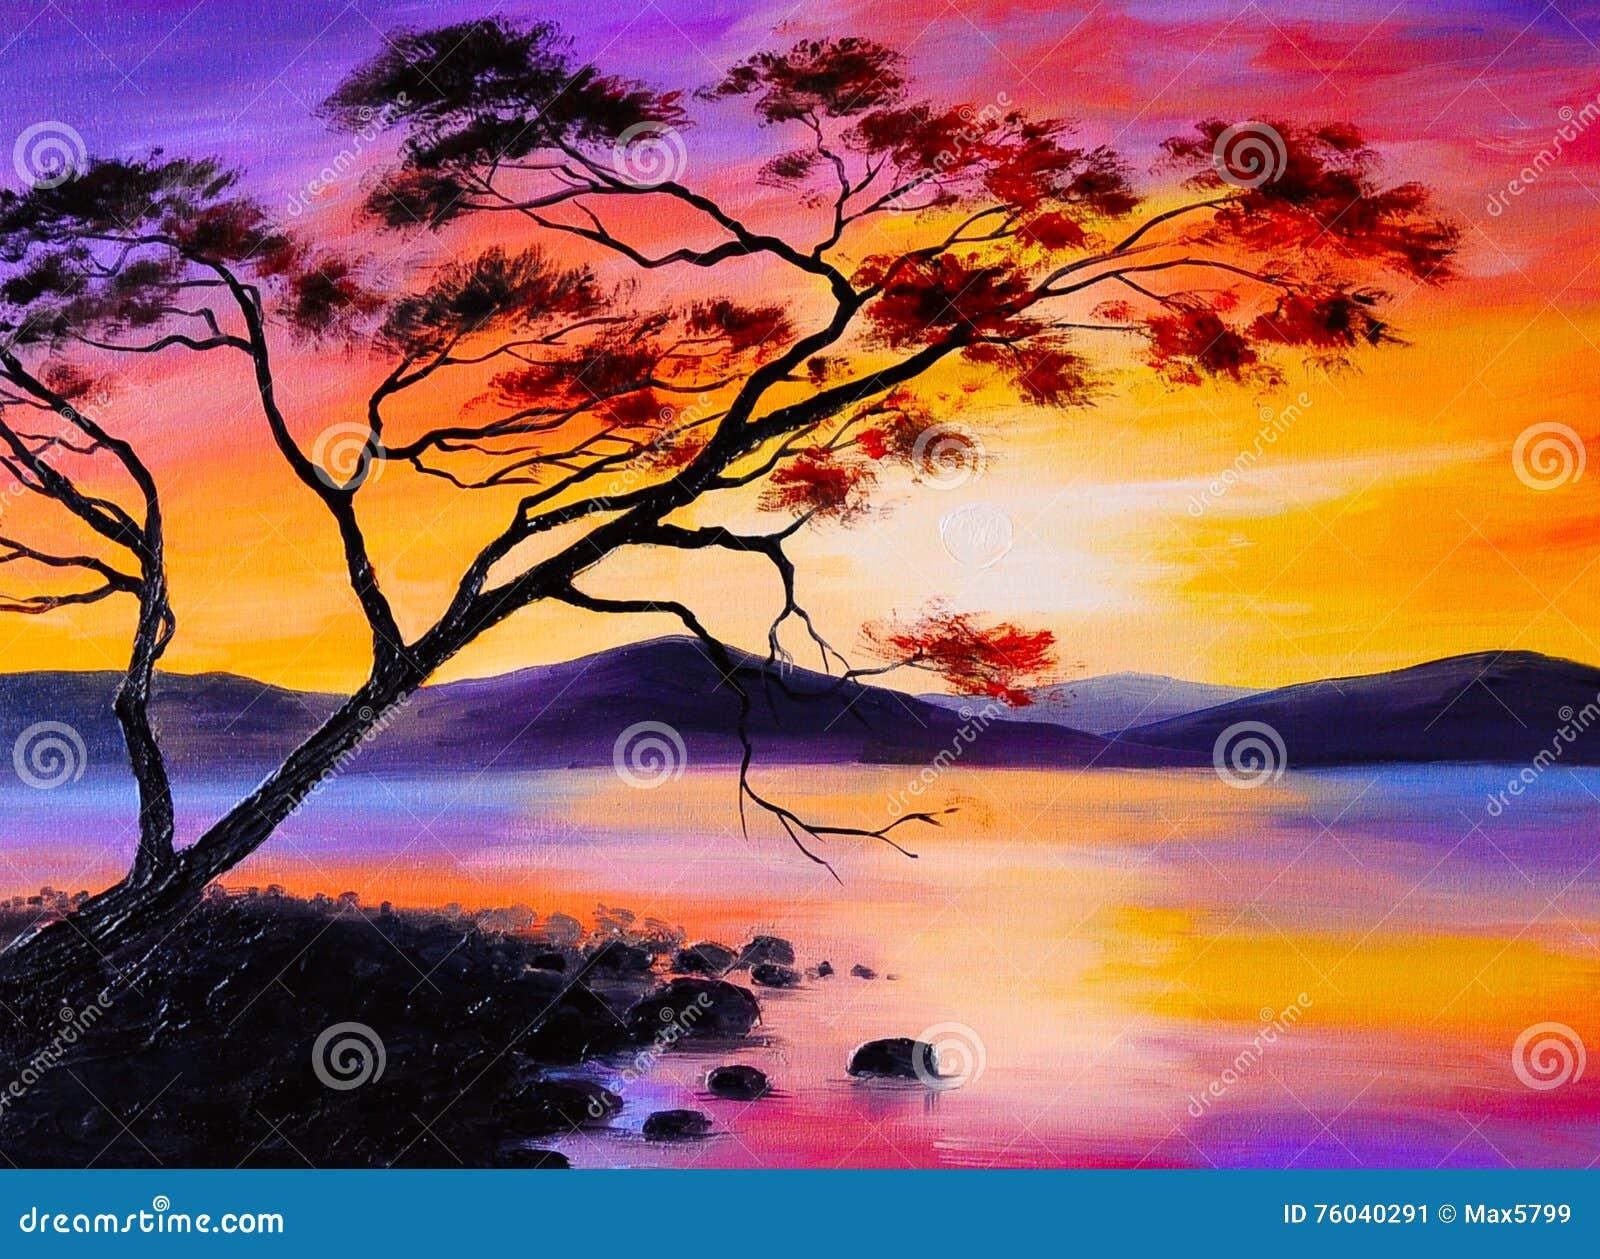 Easy Sunset Oil Painting